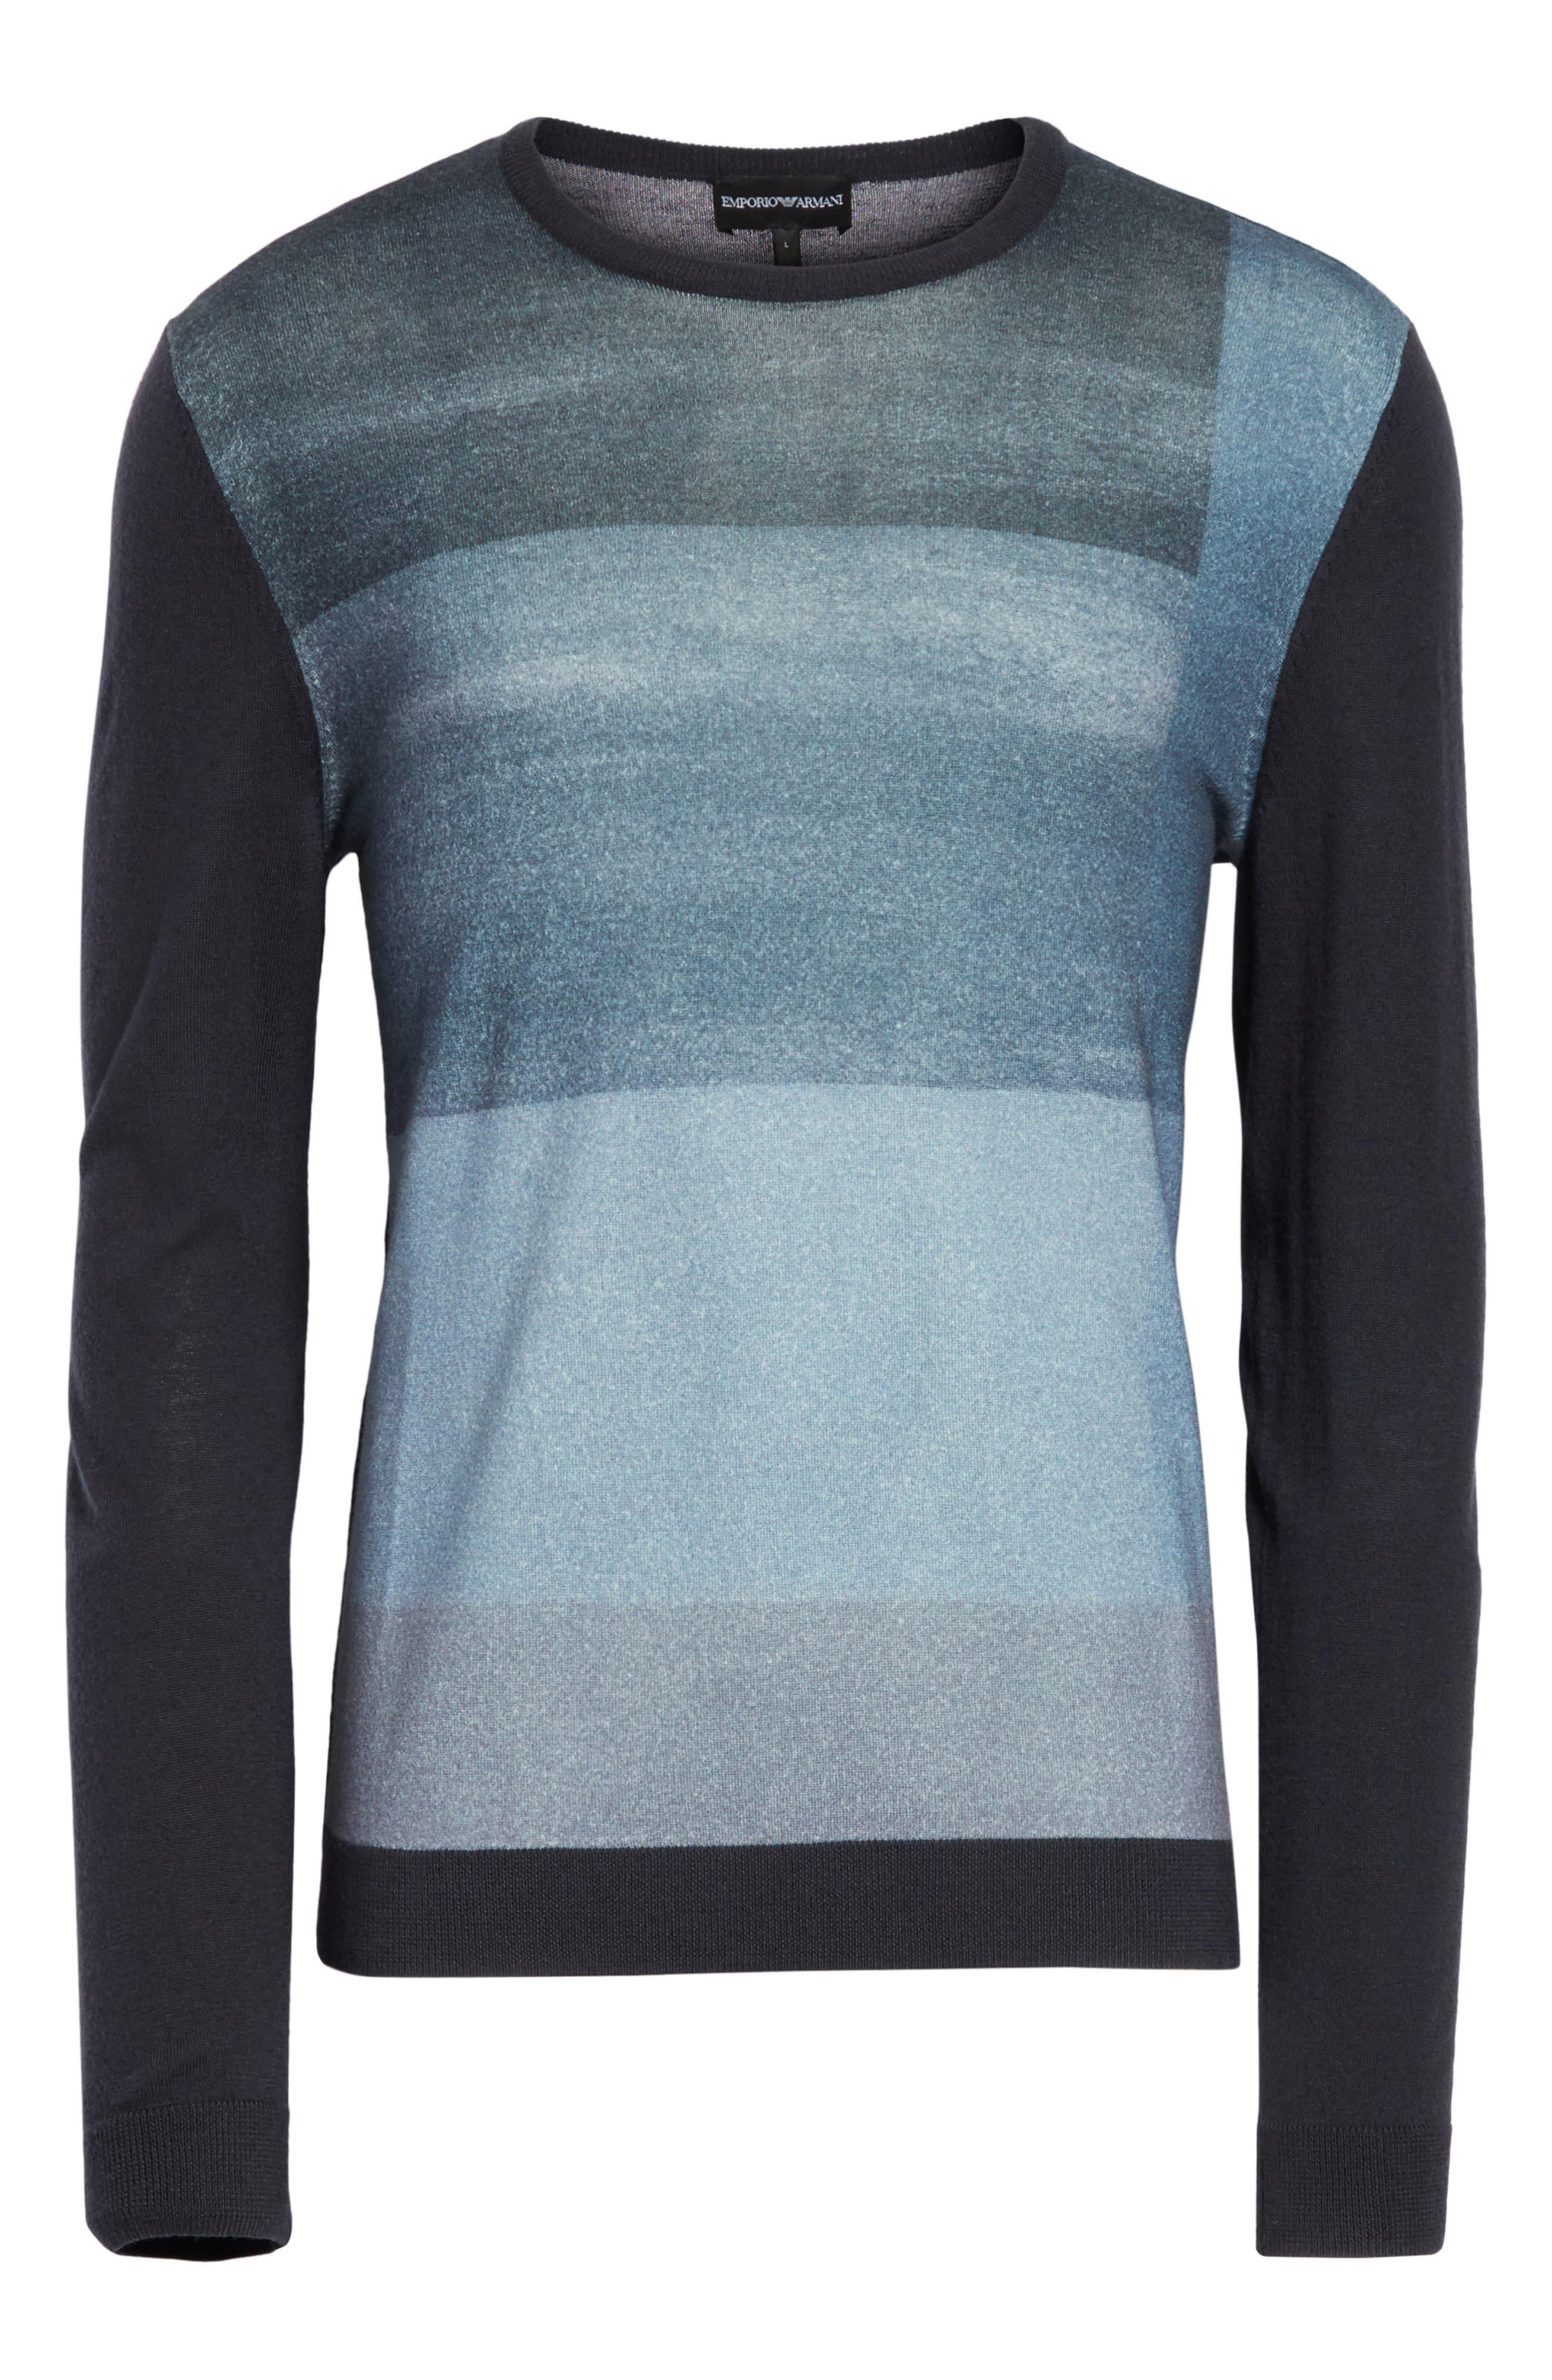 Crewneck Colorblock Slim Fit Sweater,                             Alternate thumbnail 6, color,                             Blue Multi